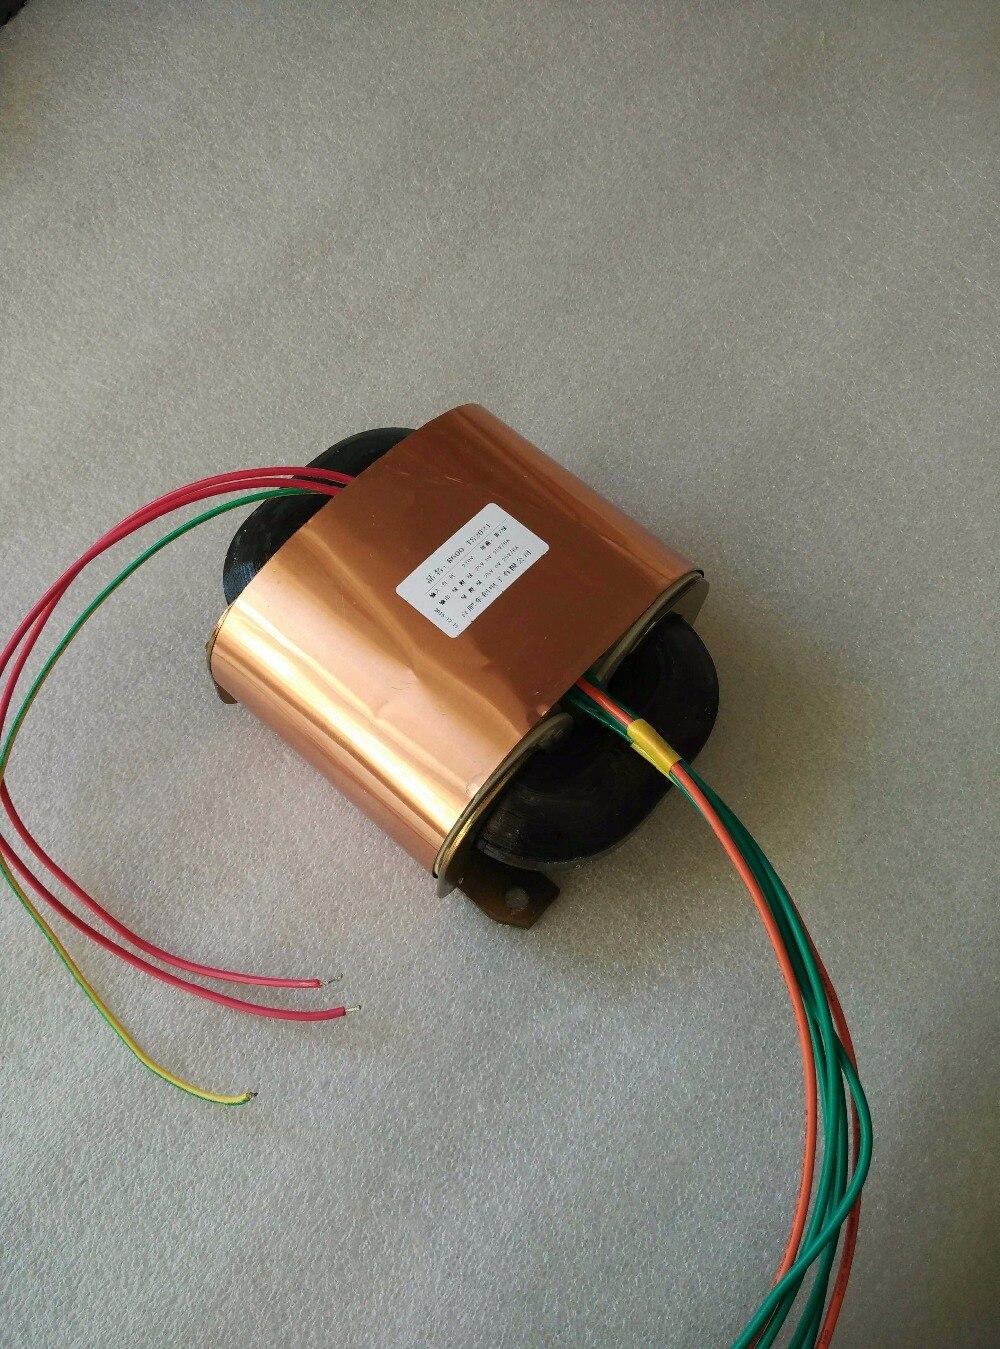 25V-0-25V 6A 25V-0-25V 6A R Core Transformer 600VA R600 custom transformer 220V copper shield Power amplifier 6a 12 30 1b yhb 14 k 050405